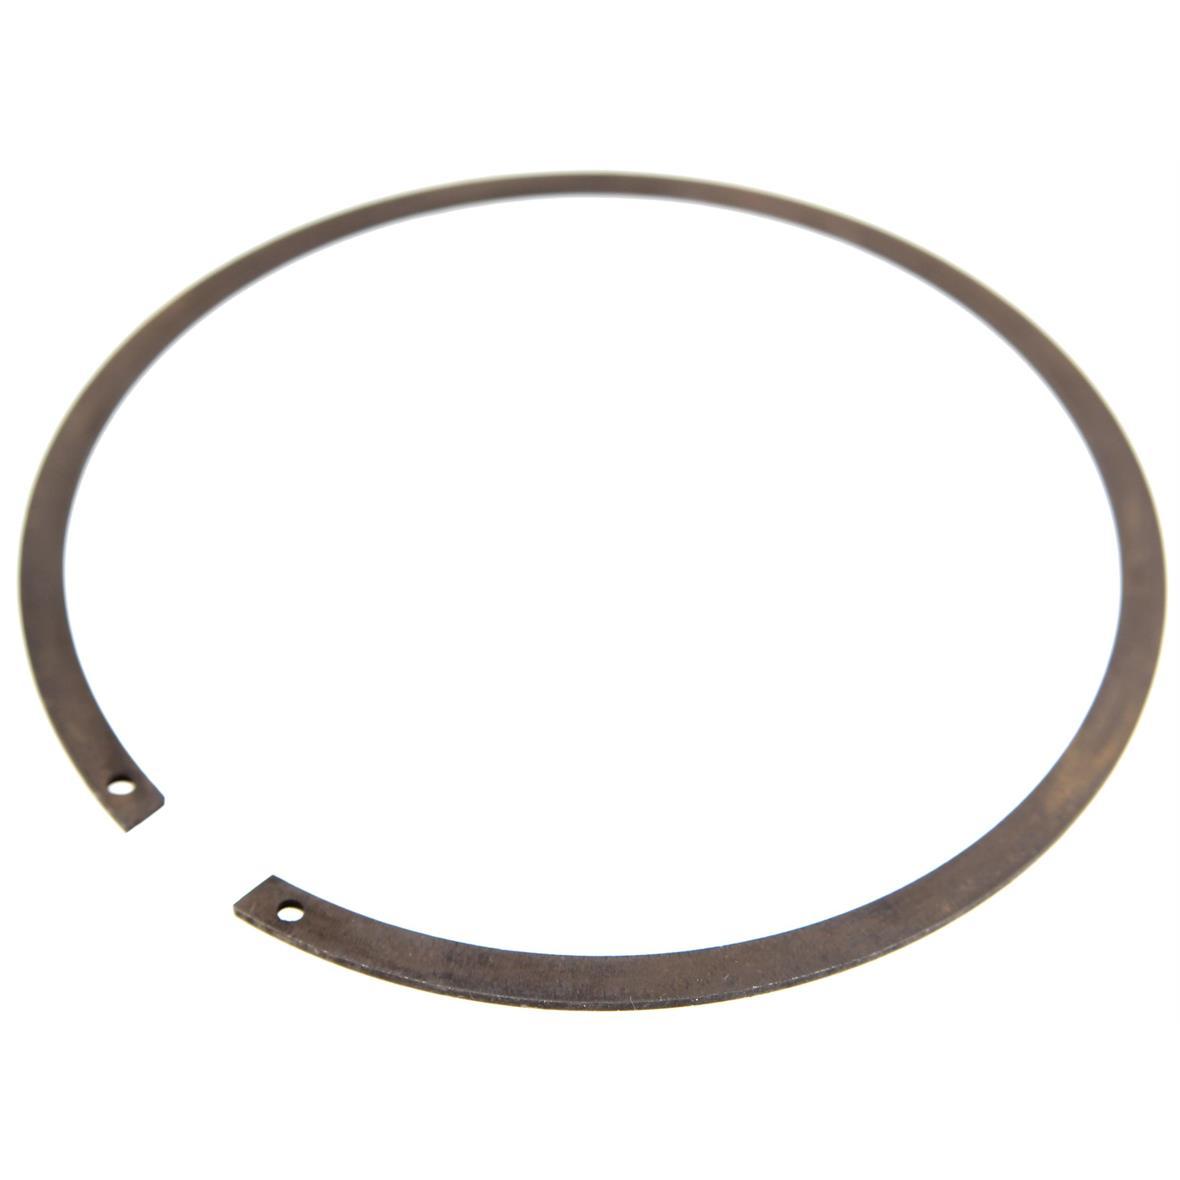 Productafbeelding voor 'Borgring koppelingskorf SIPTitle'